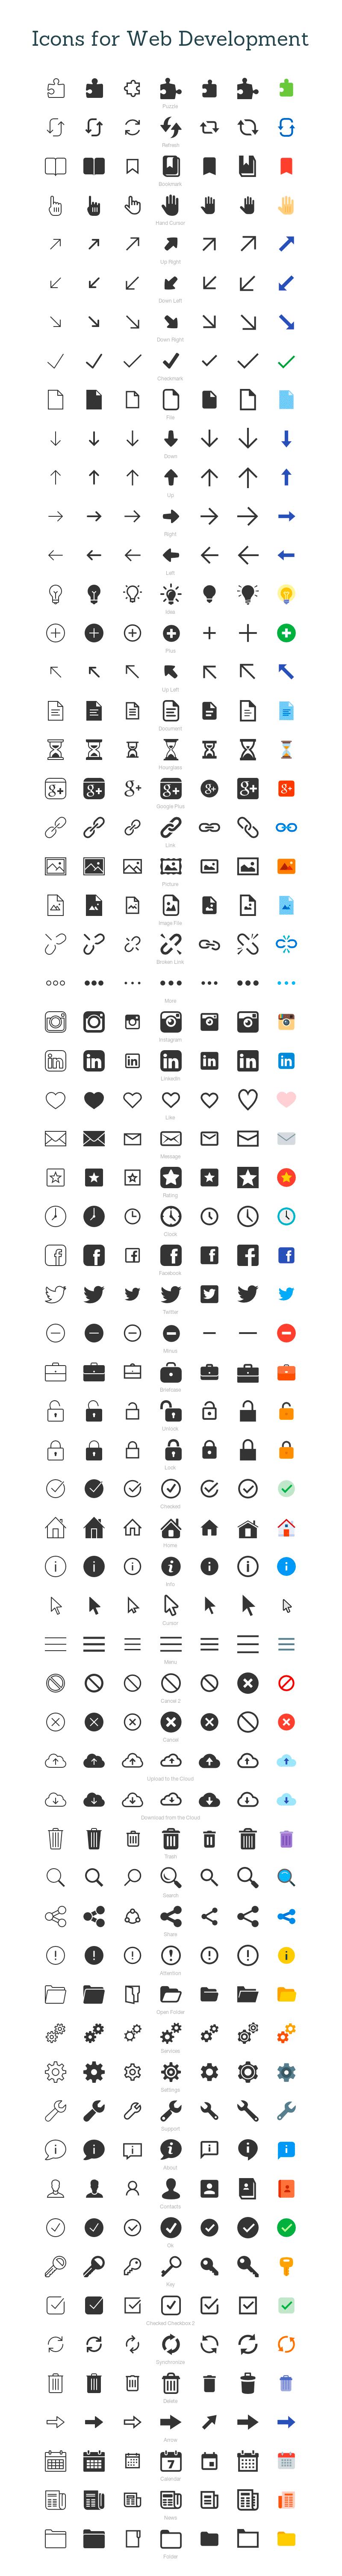 free web icon sets - Untitled-1